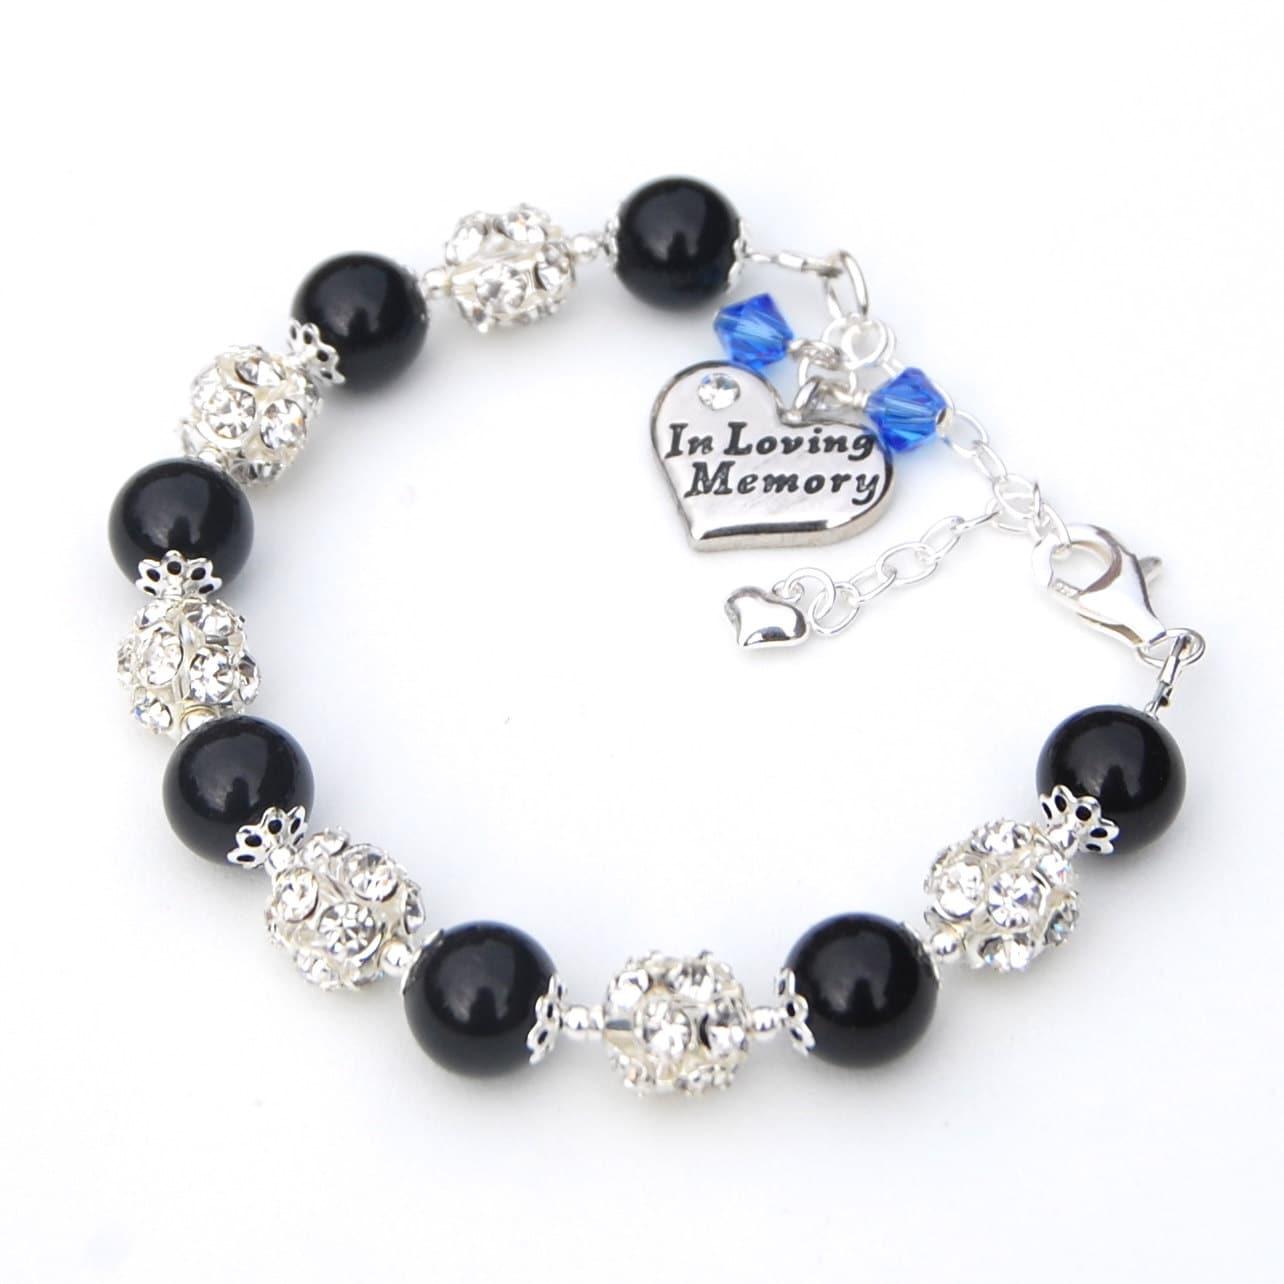 in memory jewelry in loving memory charm bracelet by